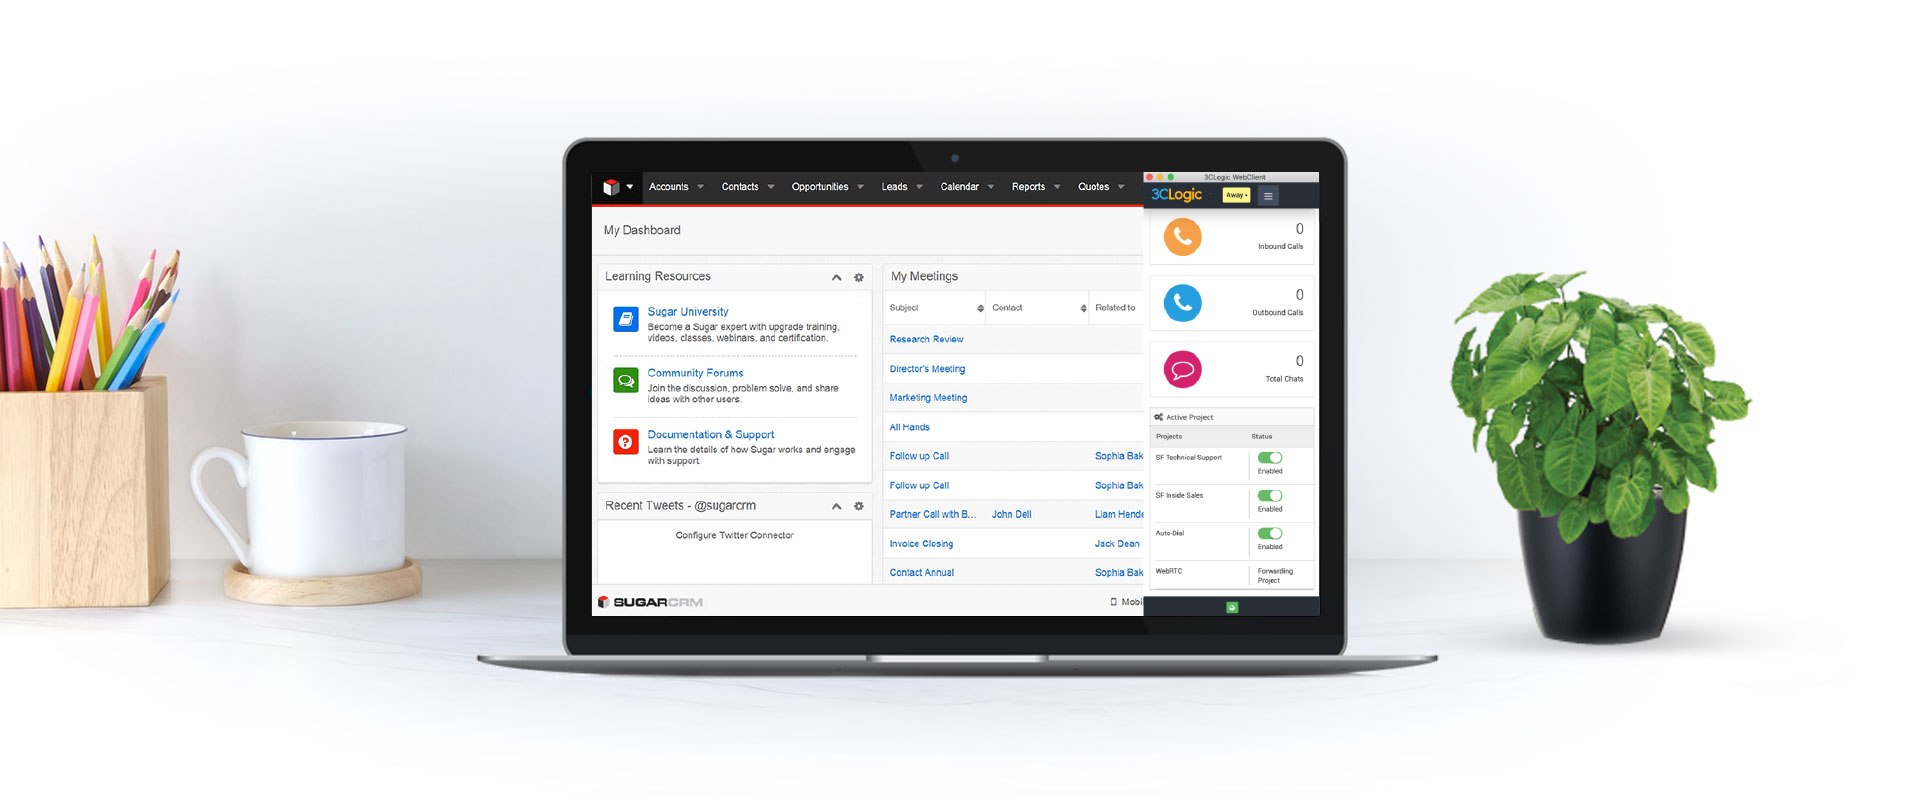 Laptop with screenshot of 3CLogic's Sugar CRM integration